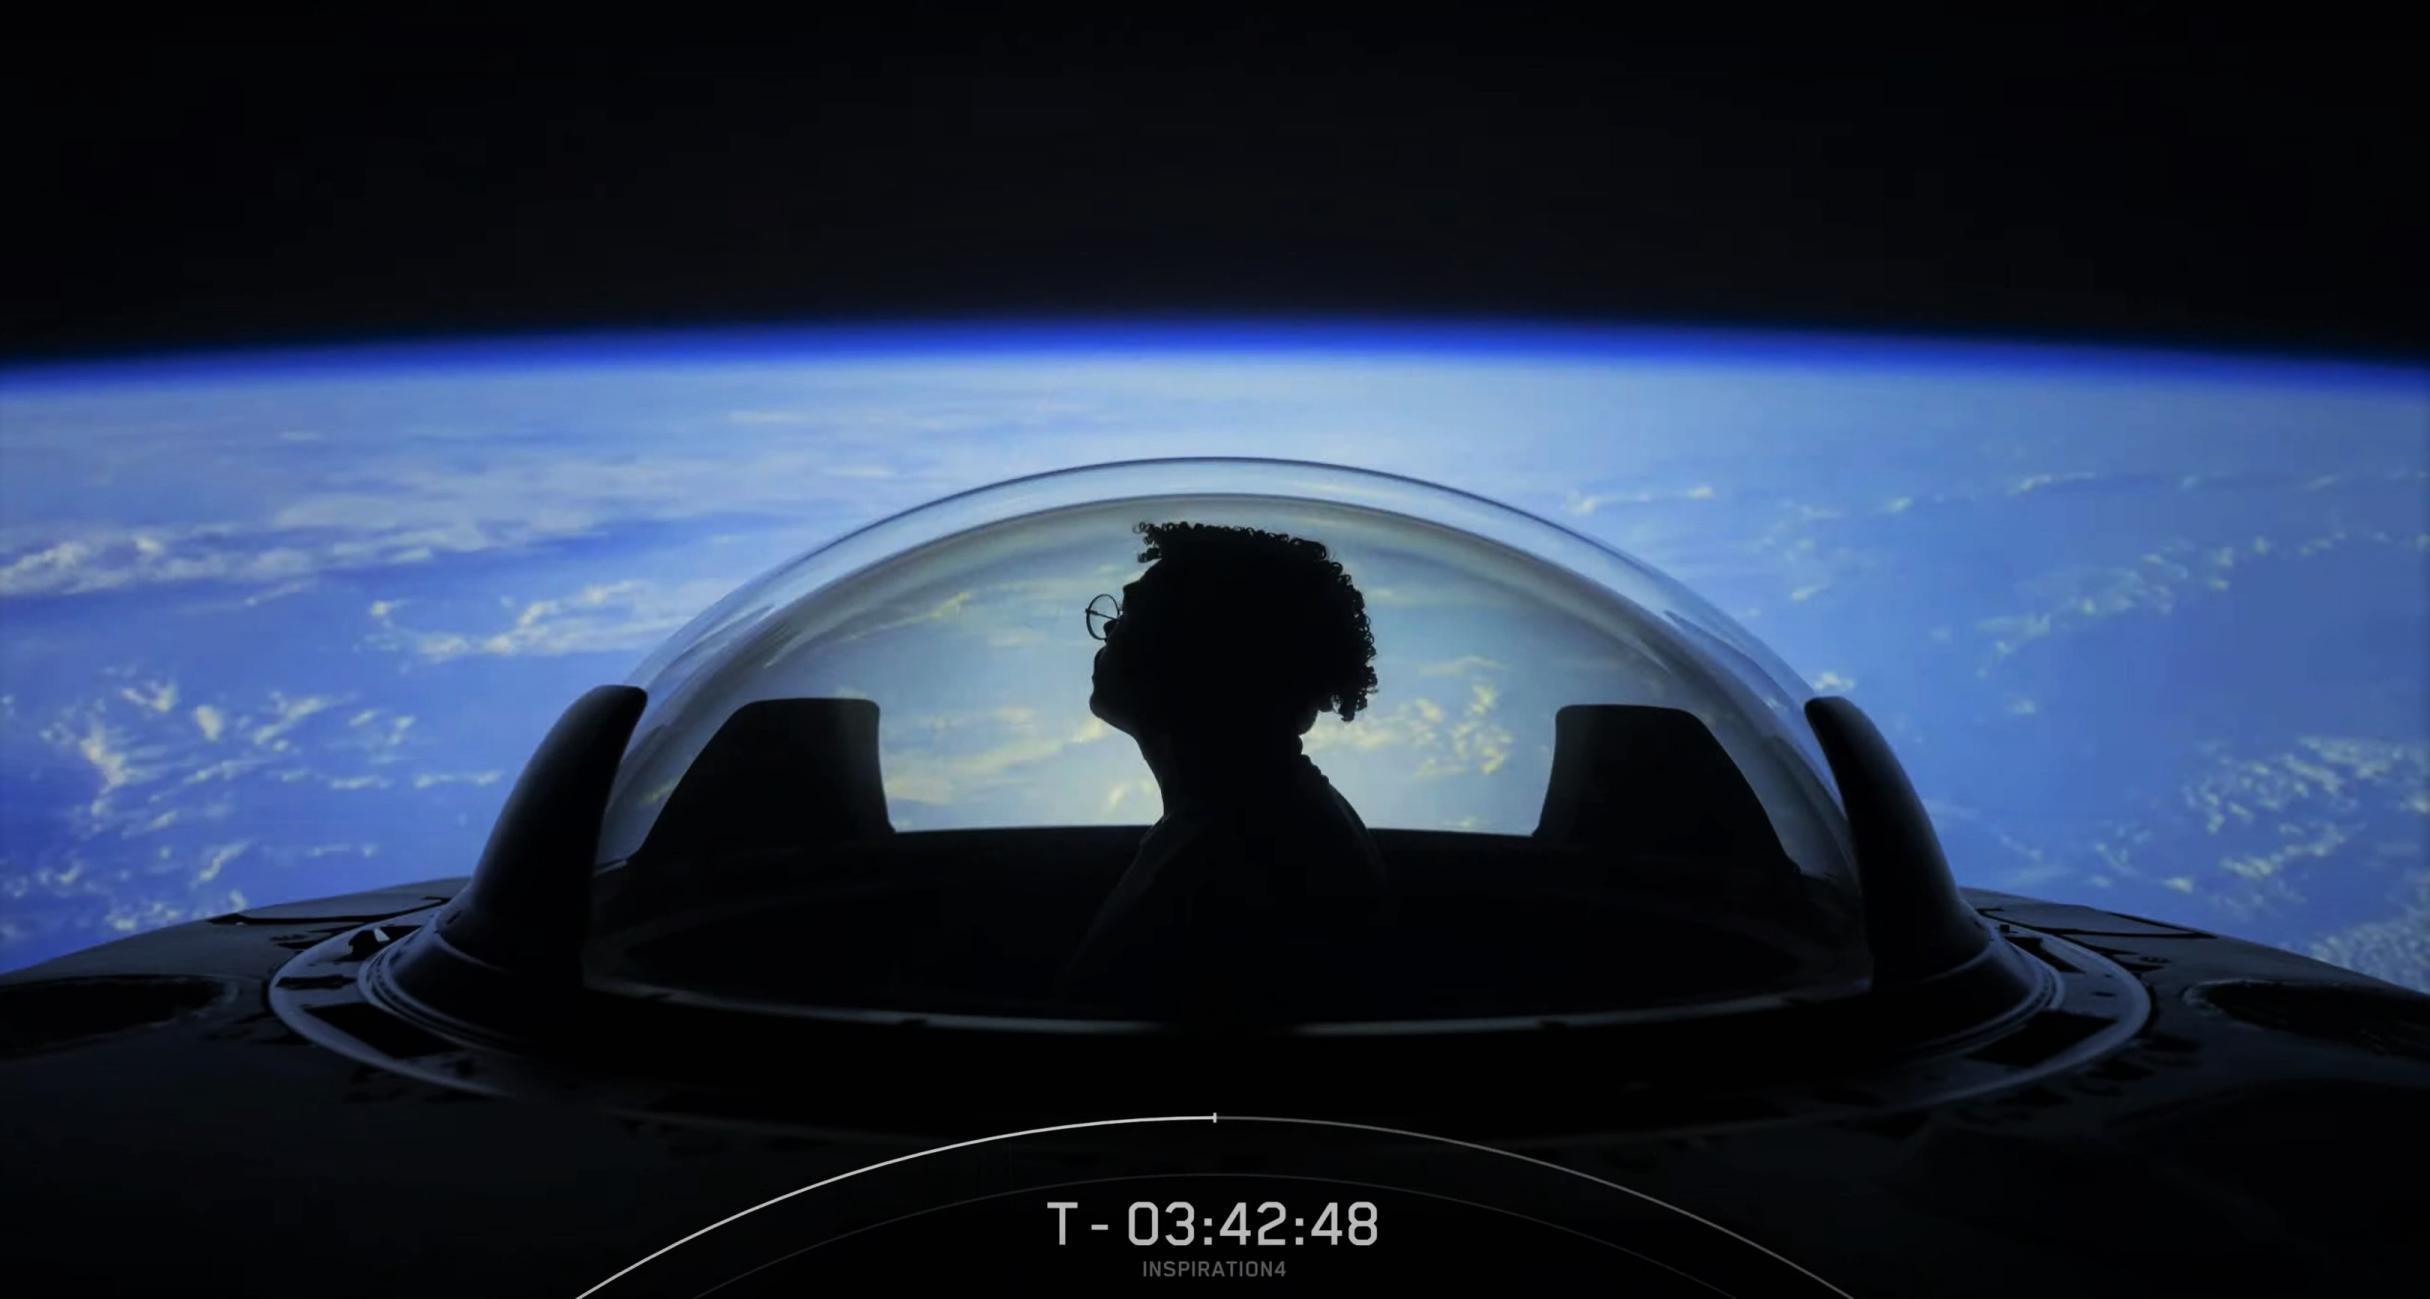 Inspiration4 Dragon C207 F9 B1062 091521 webcast (SpaceX) cupola 5 crop (c)